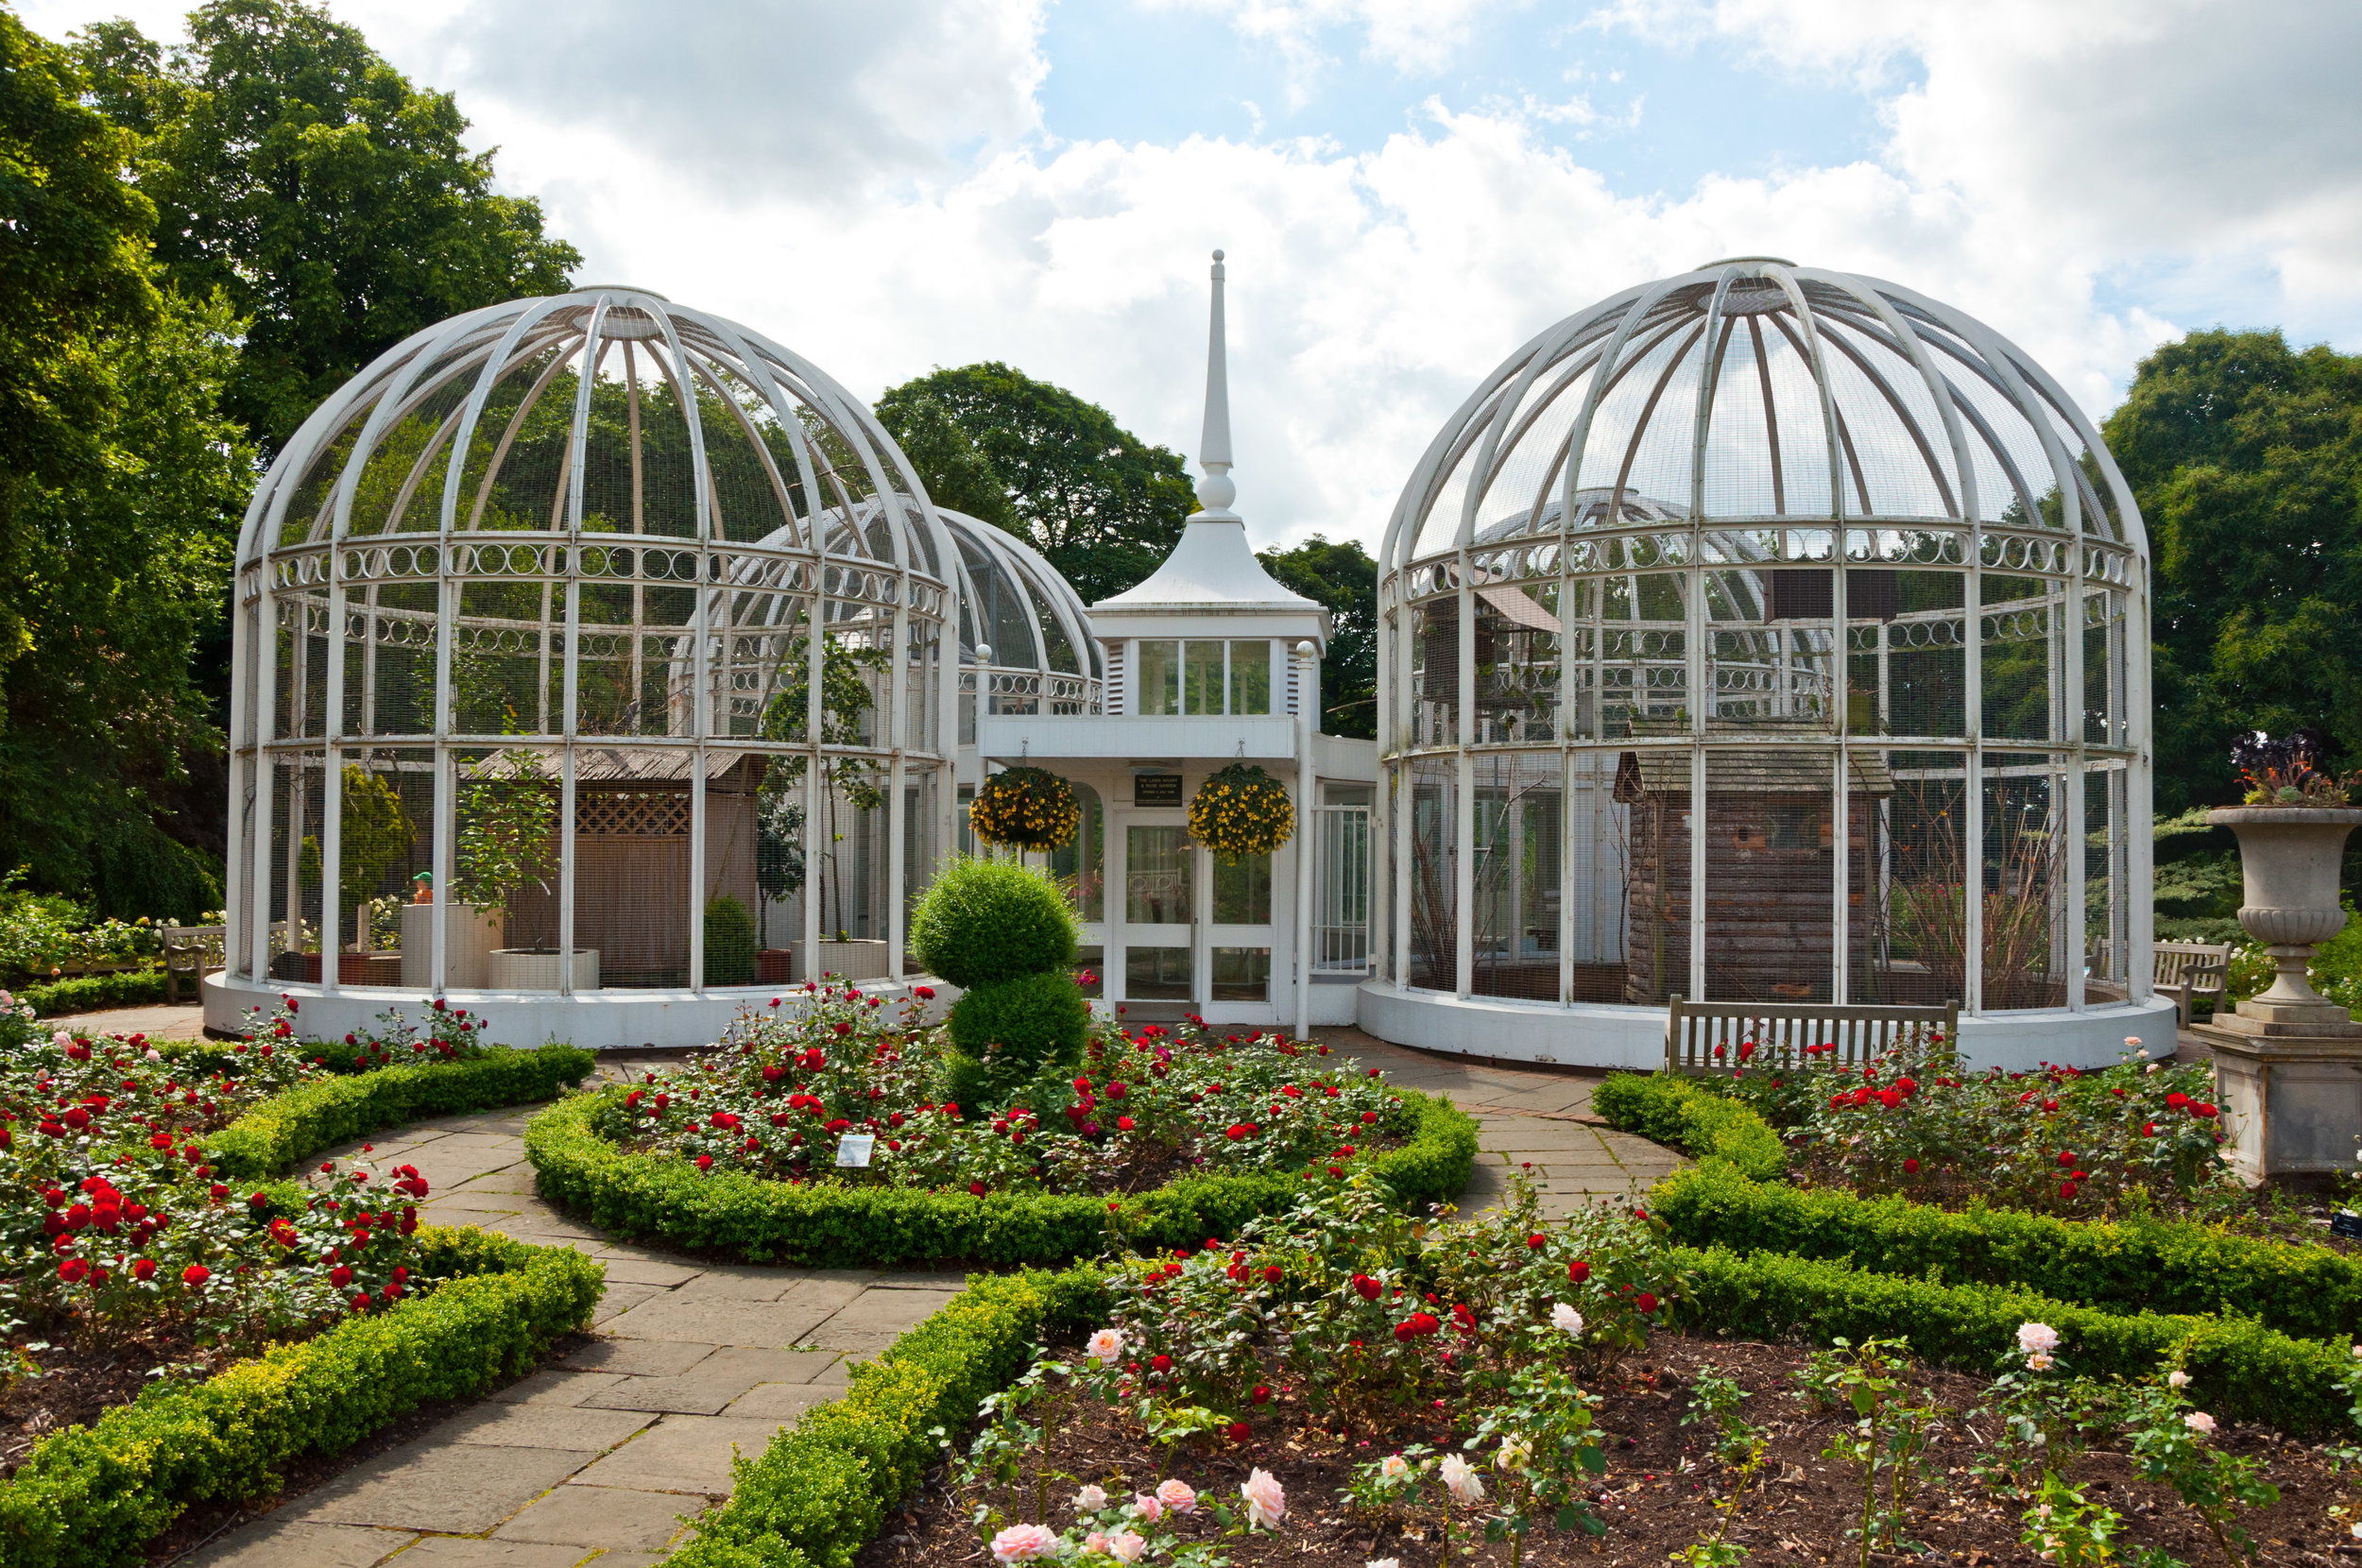 079 - Birmingham Botanical Gardens - Aviary.jpg